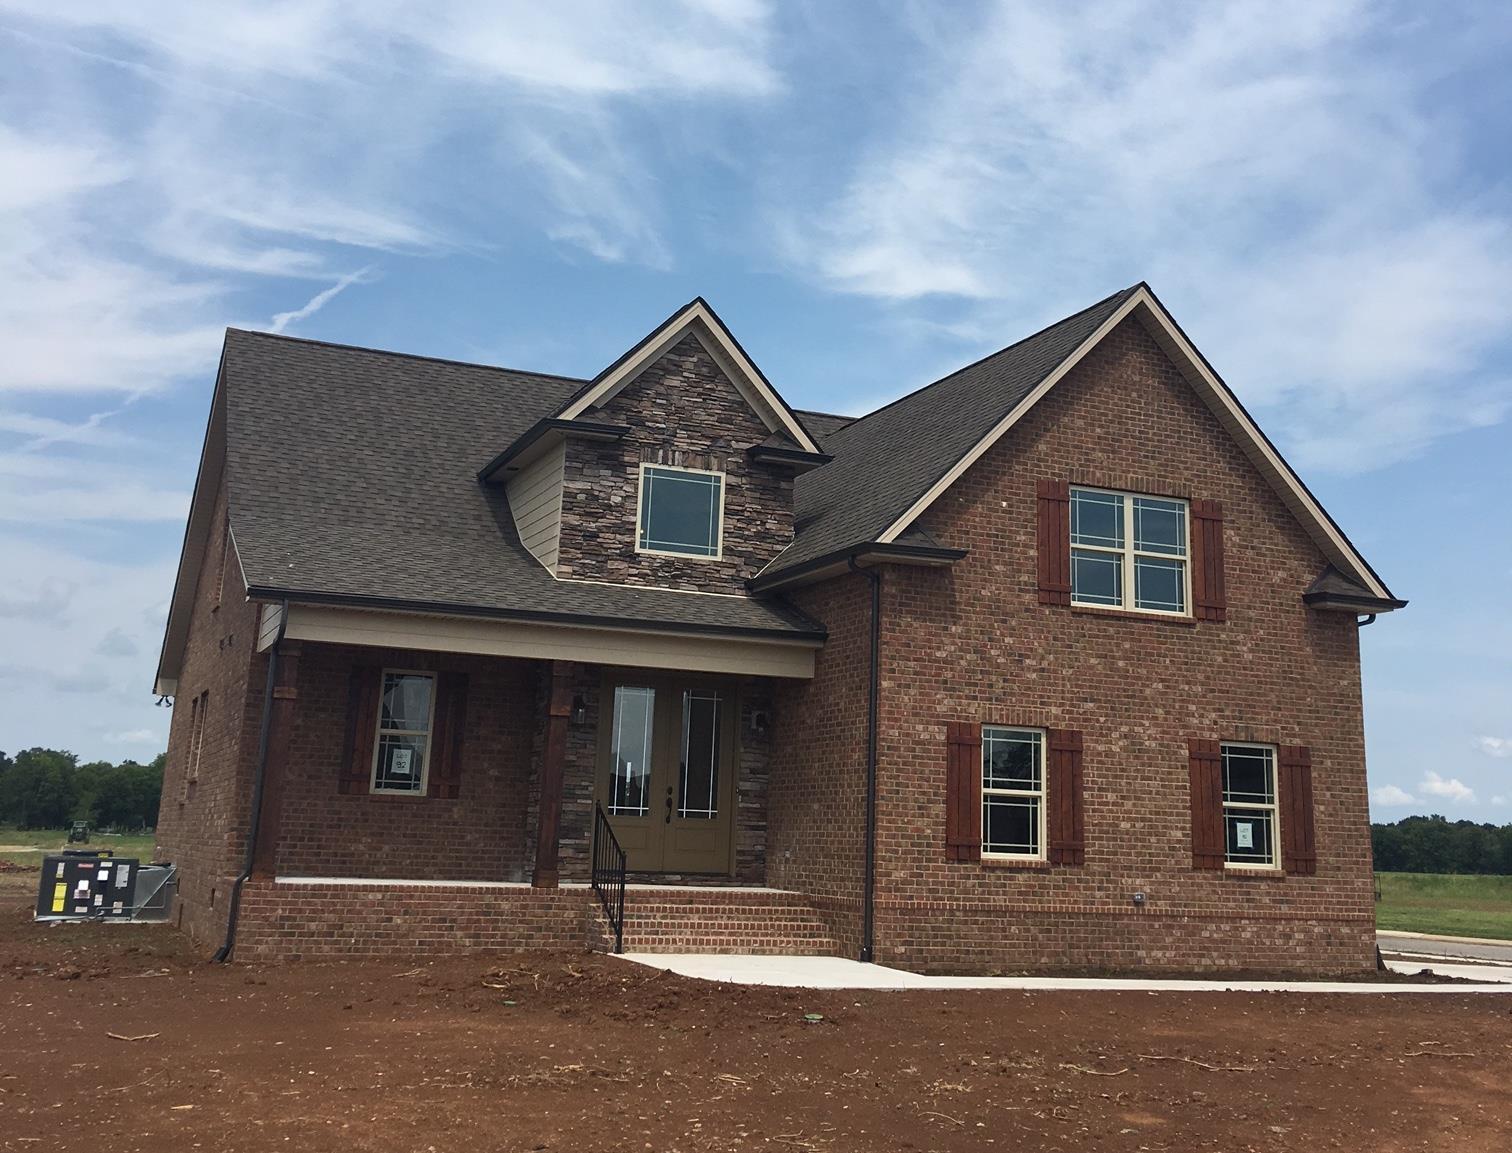 Photo of 3905 Merryman Lane Lot 92  Murfreesboro  TN